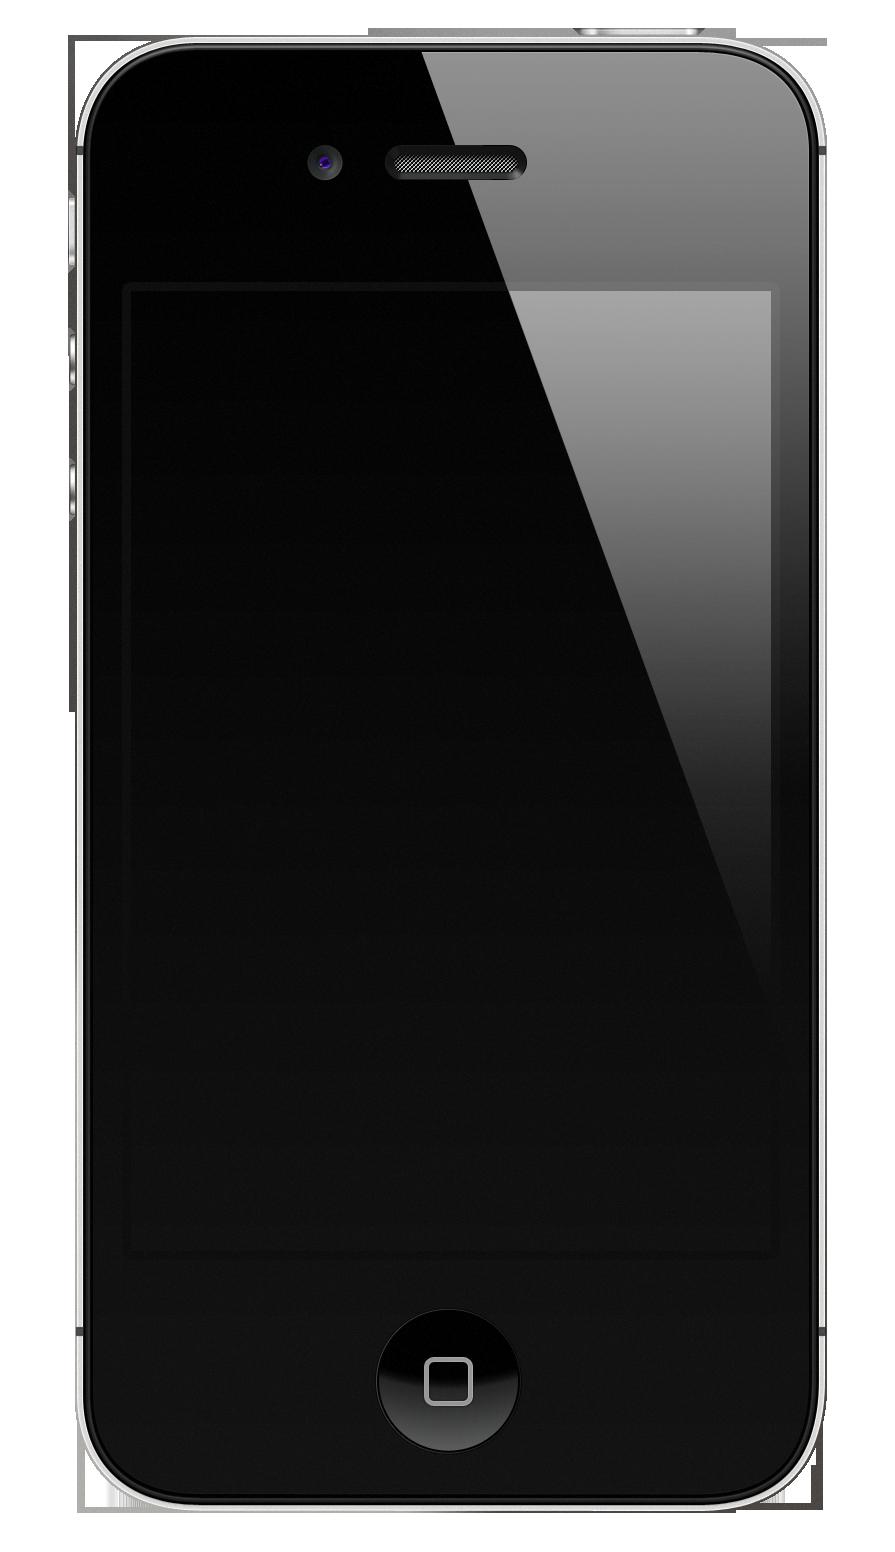 IPhone 4S No shadow